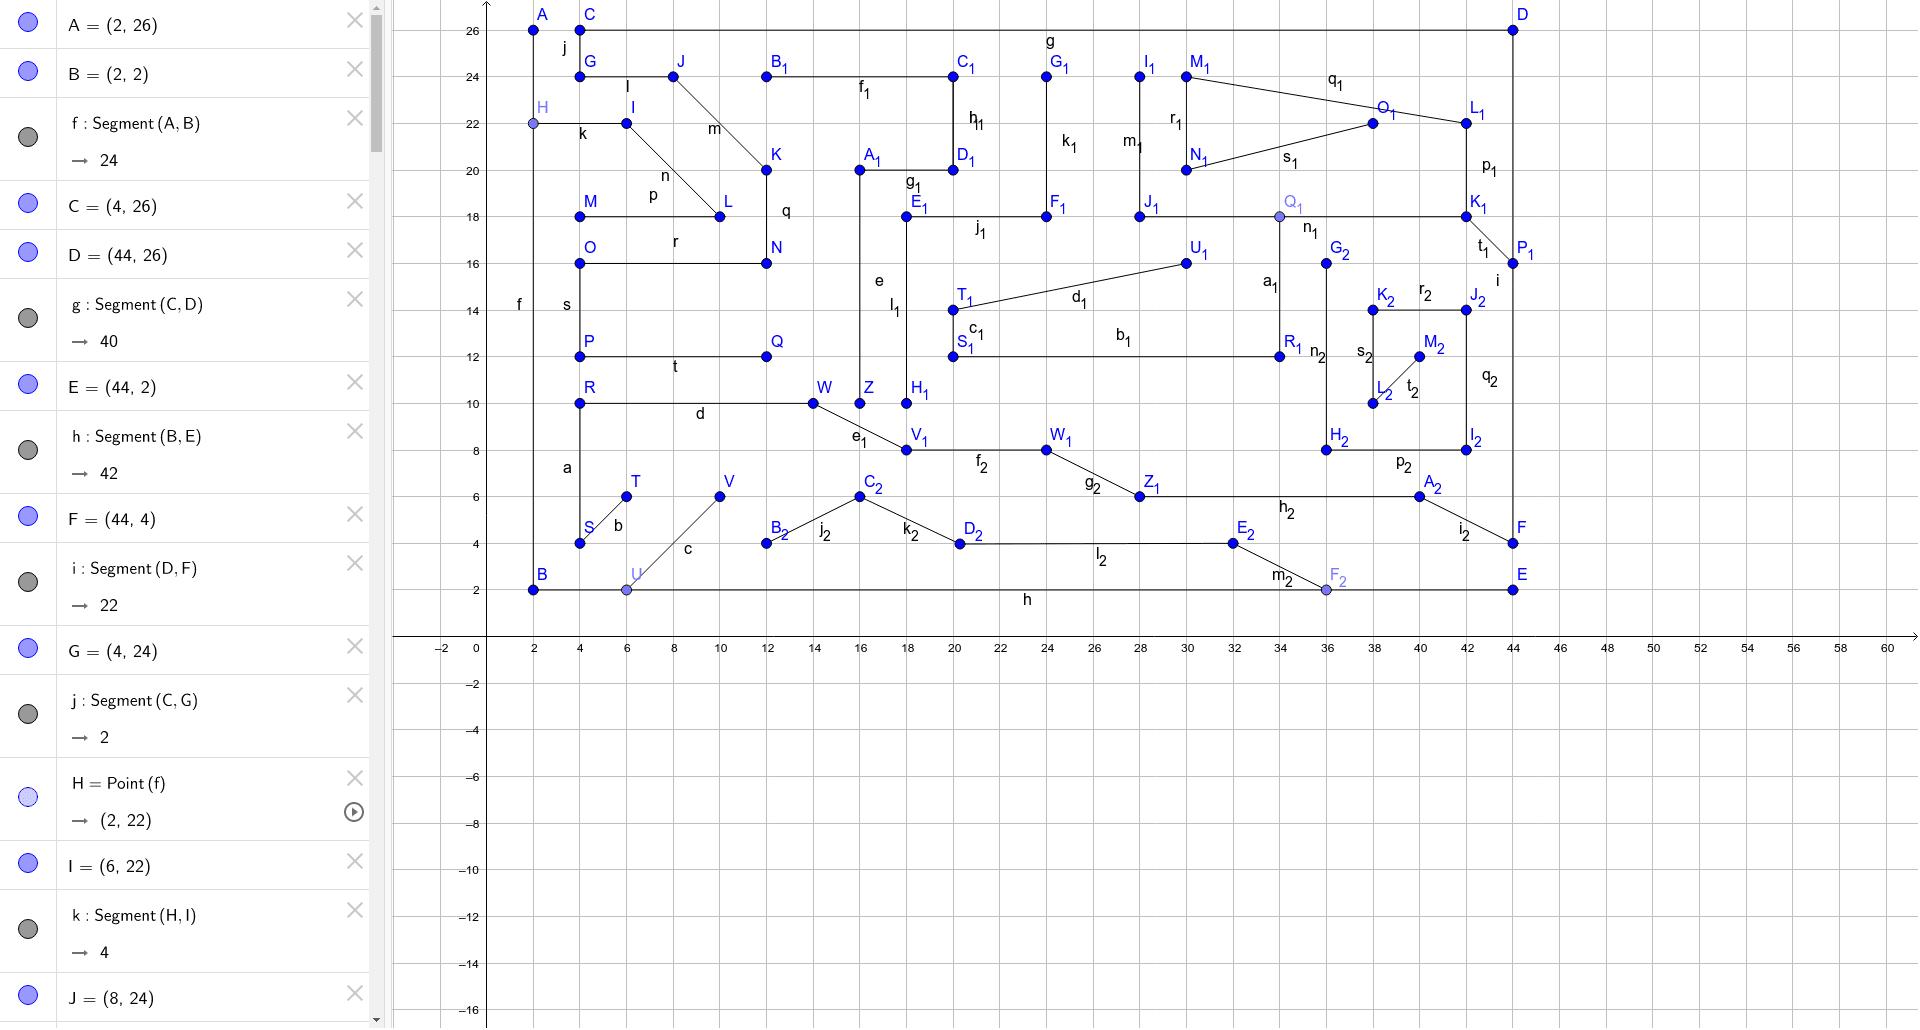 Maze 8